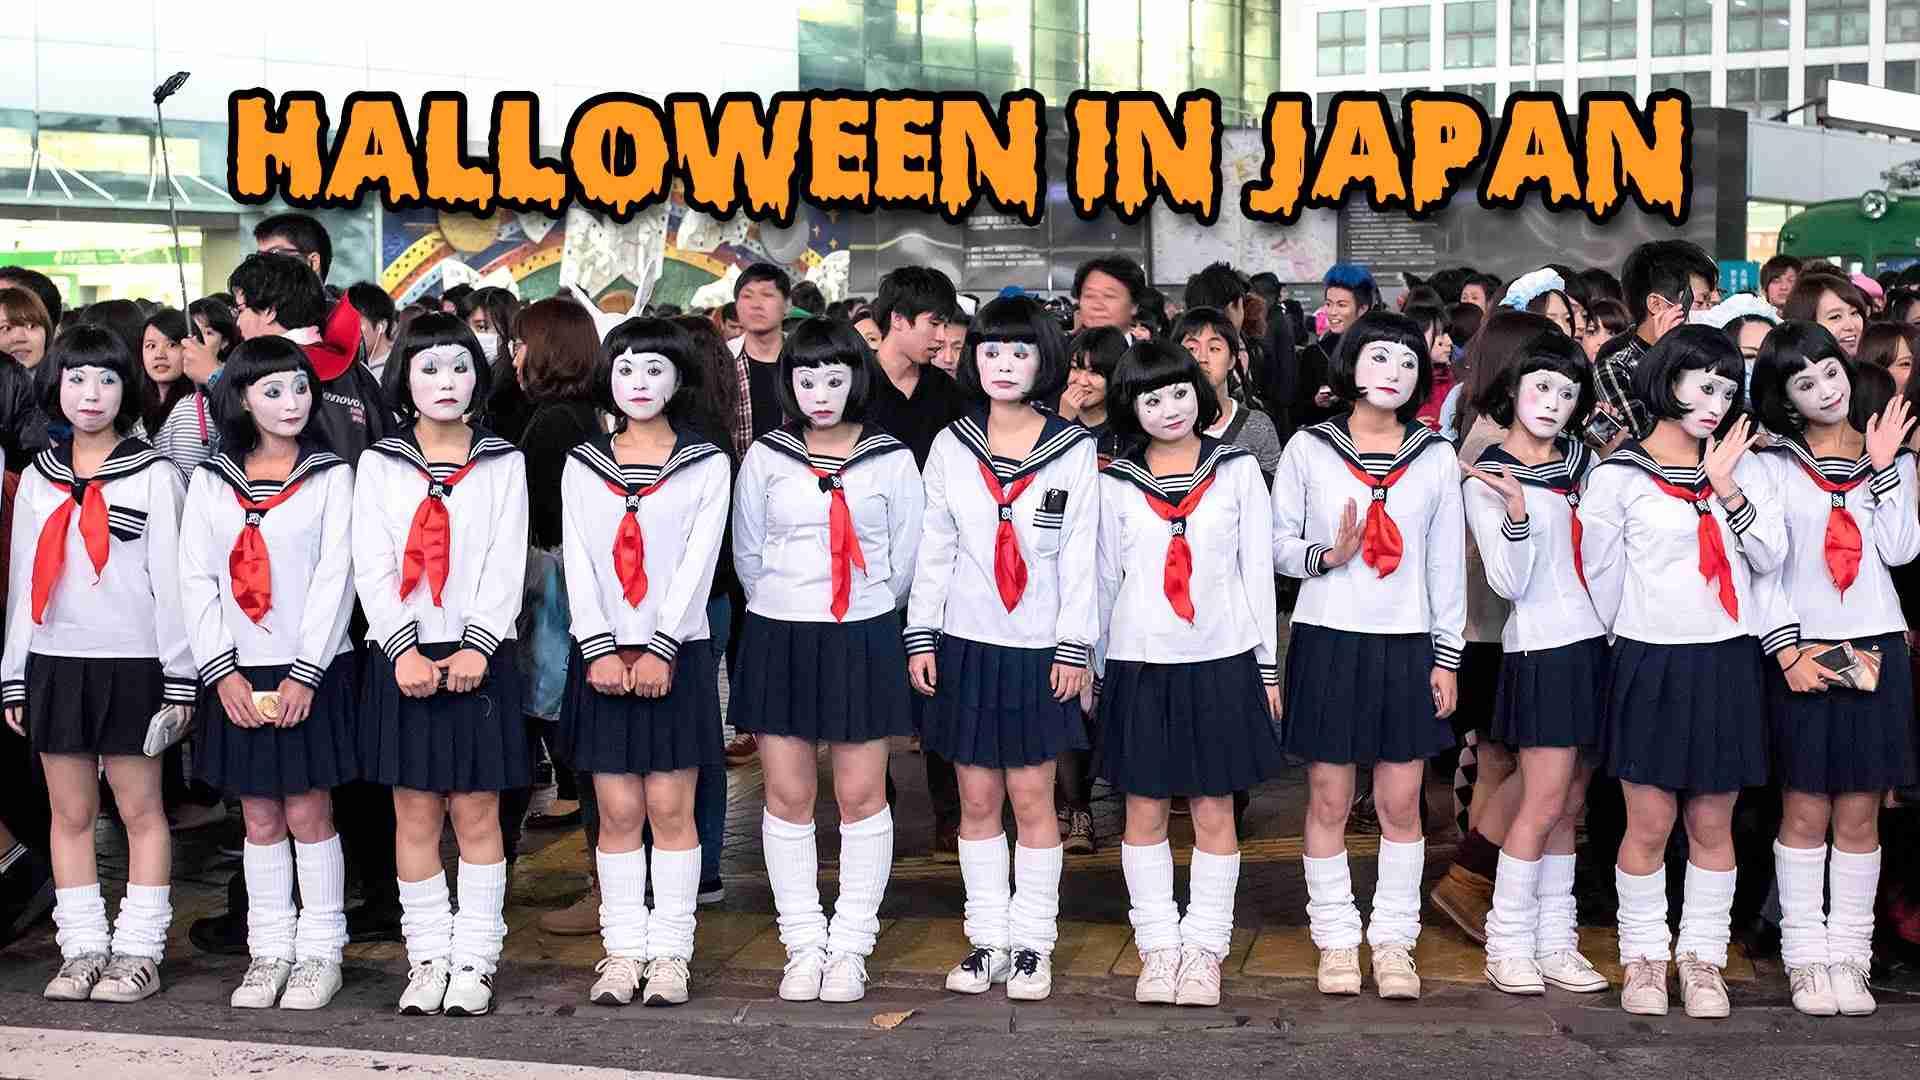 Halloween in Japan - Tokyo Costume Street Party 渋谷 ハロウィン - YouTube